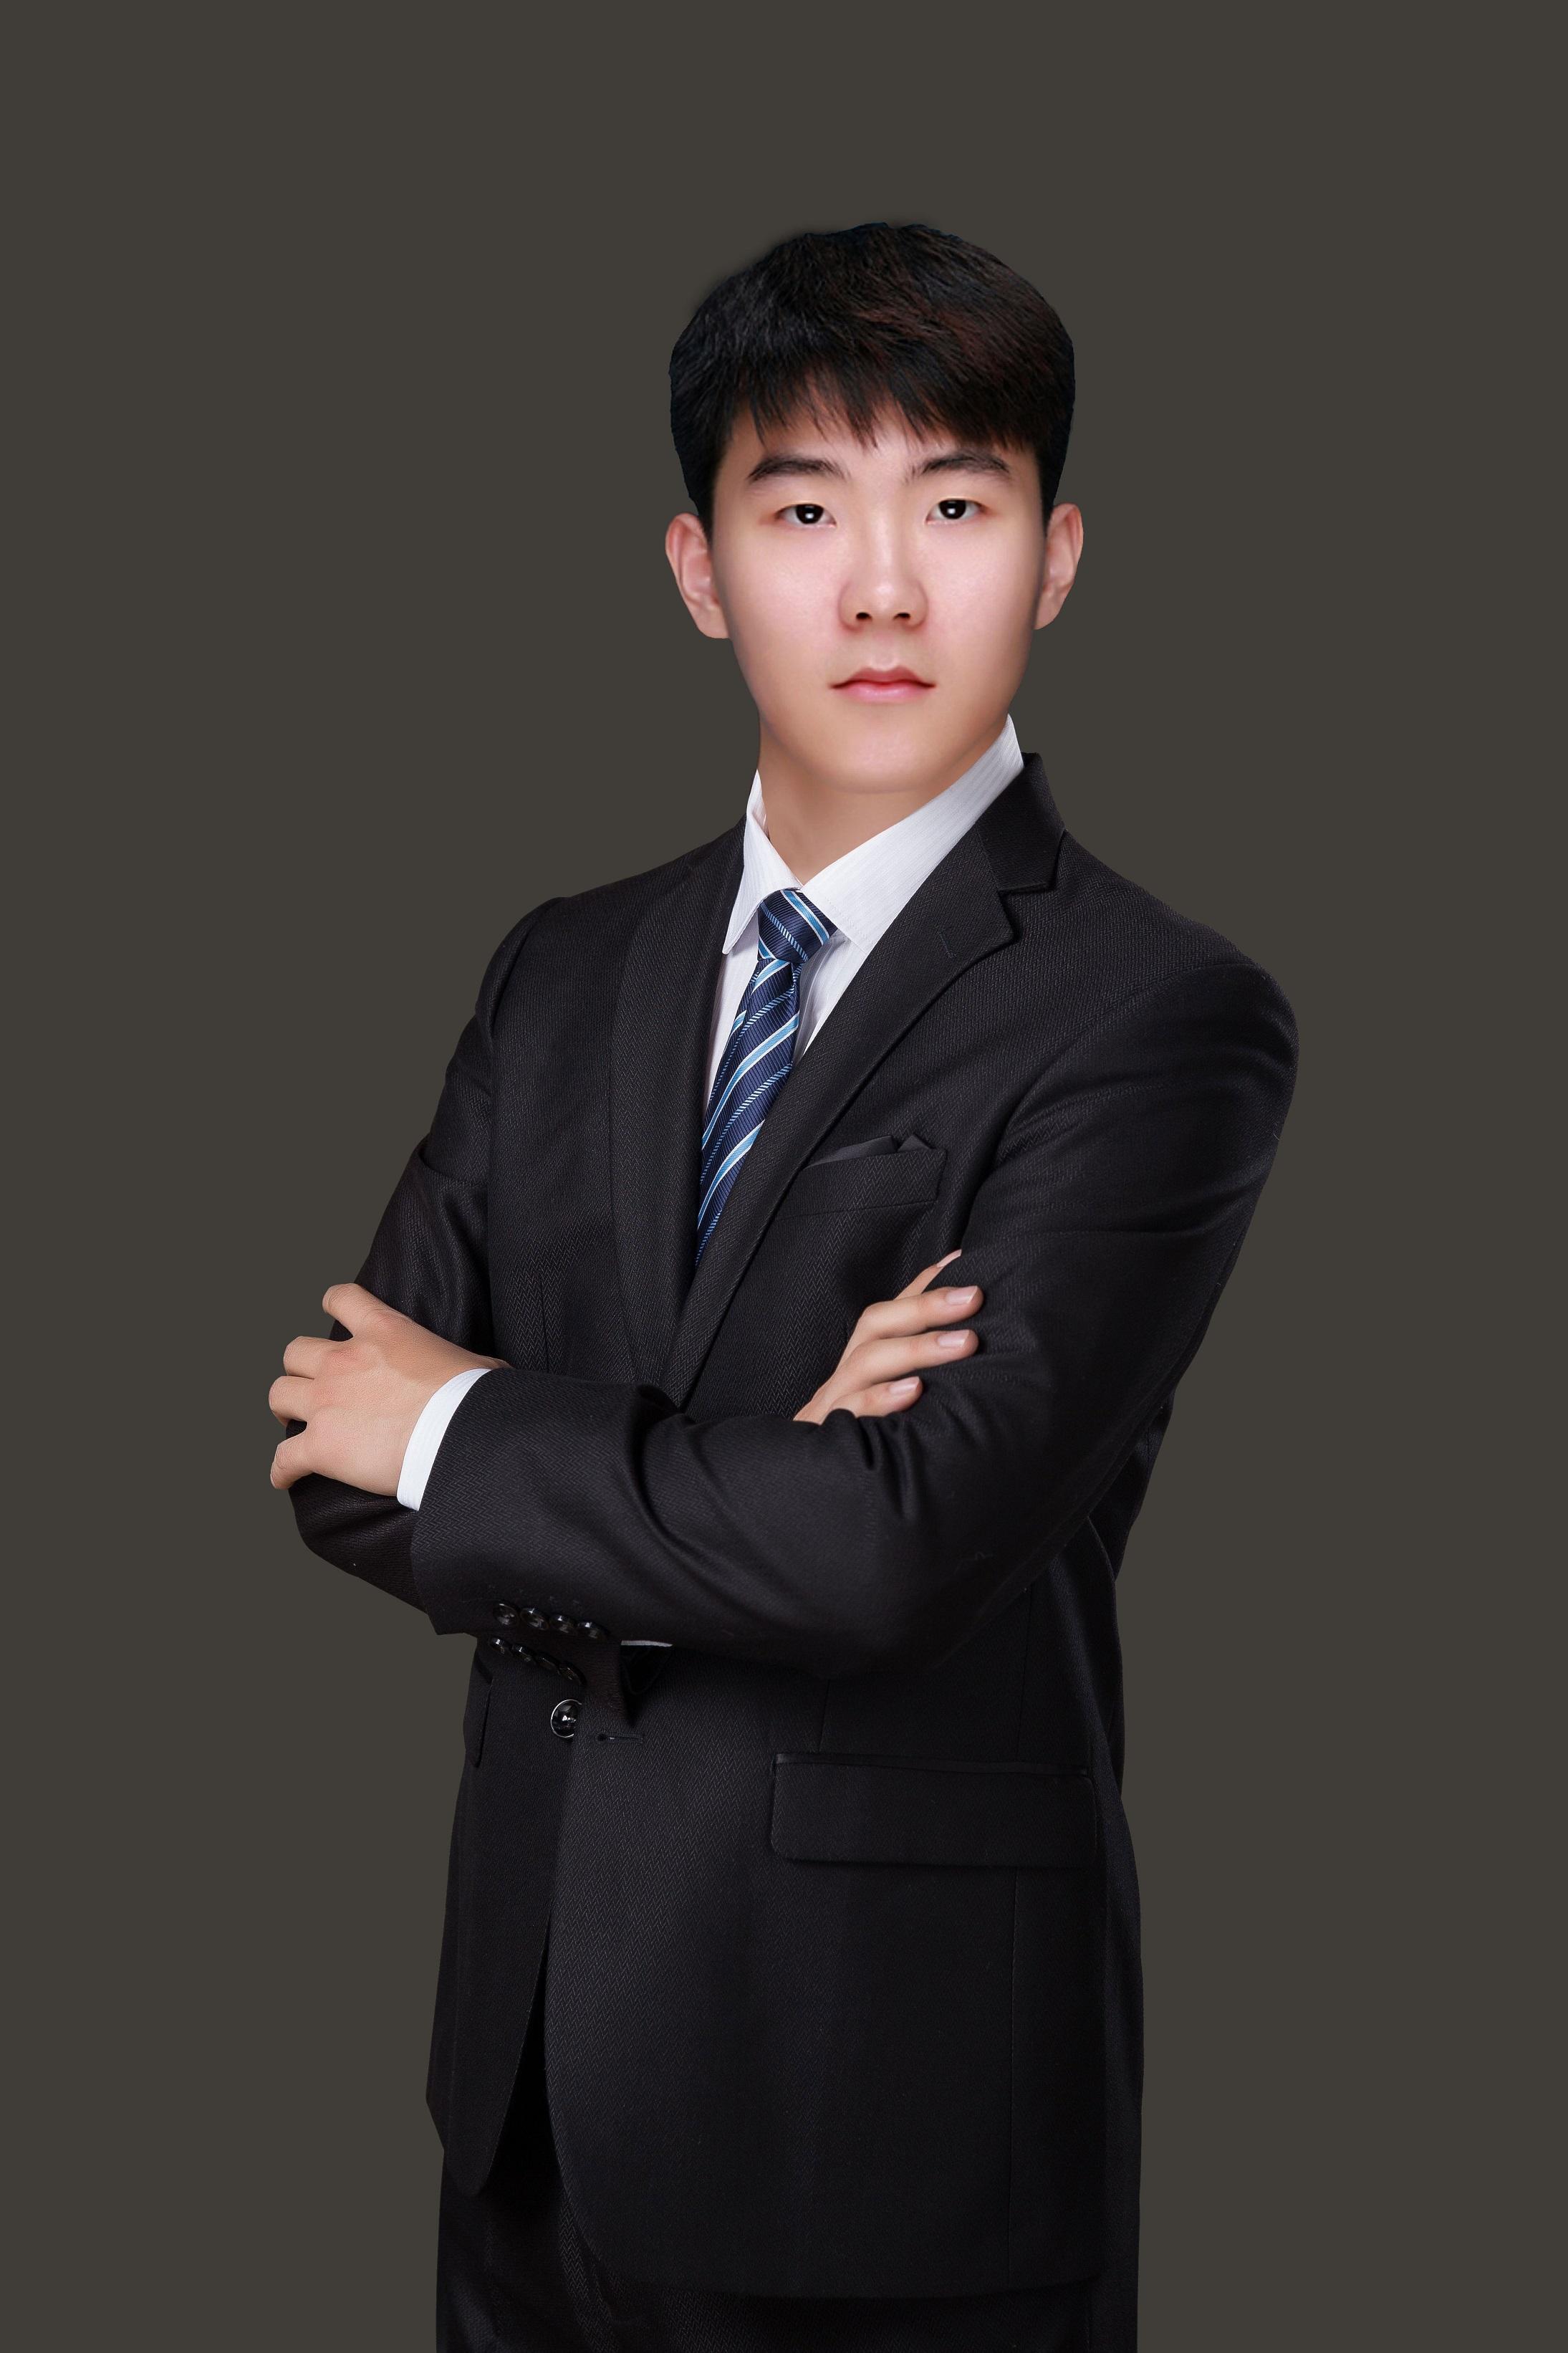 title='王兰玉实习律师'